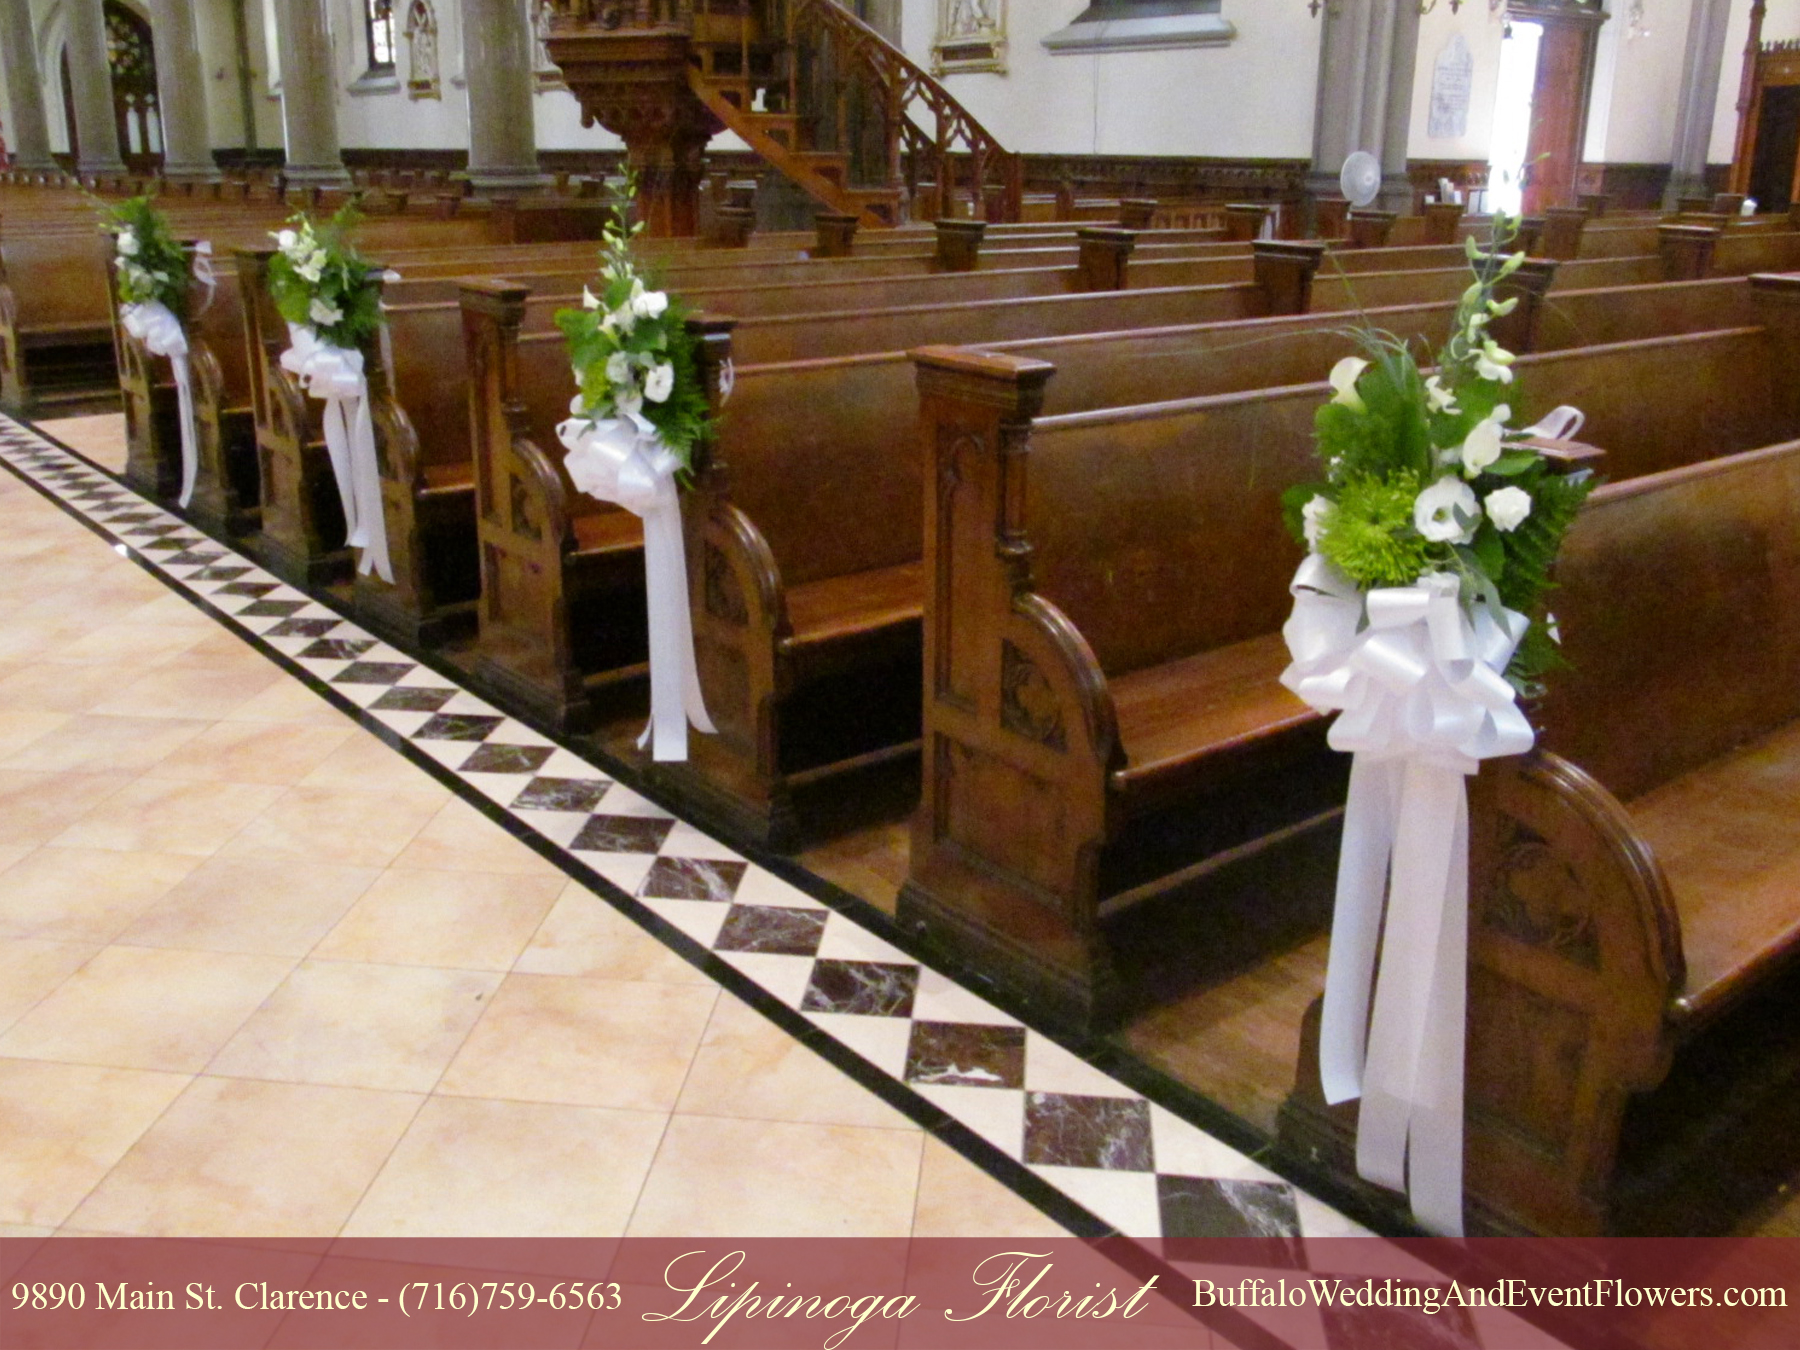 st louis roman catholic church buffalo buffalo wedding event flowers by lipinoga florist. Black Bedroom Furniture Sets. Home Design Ideas